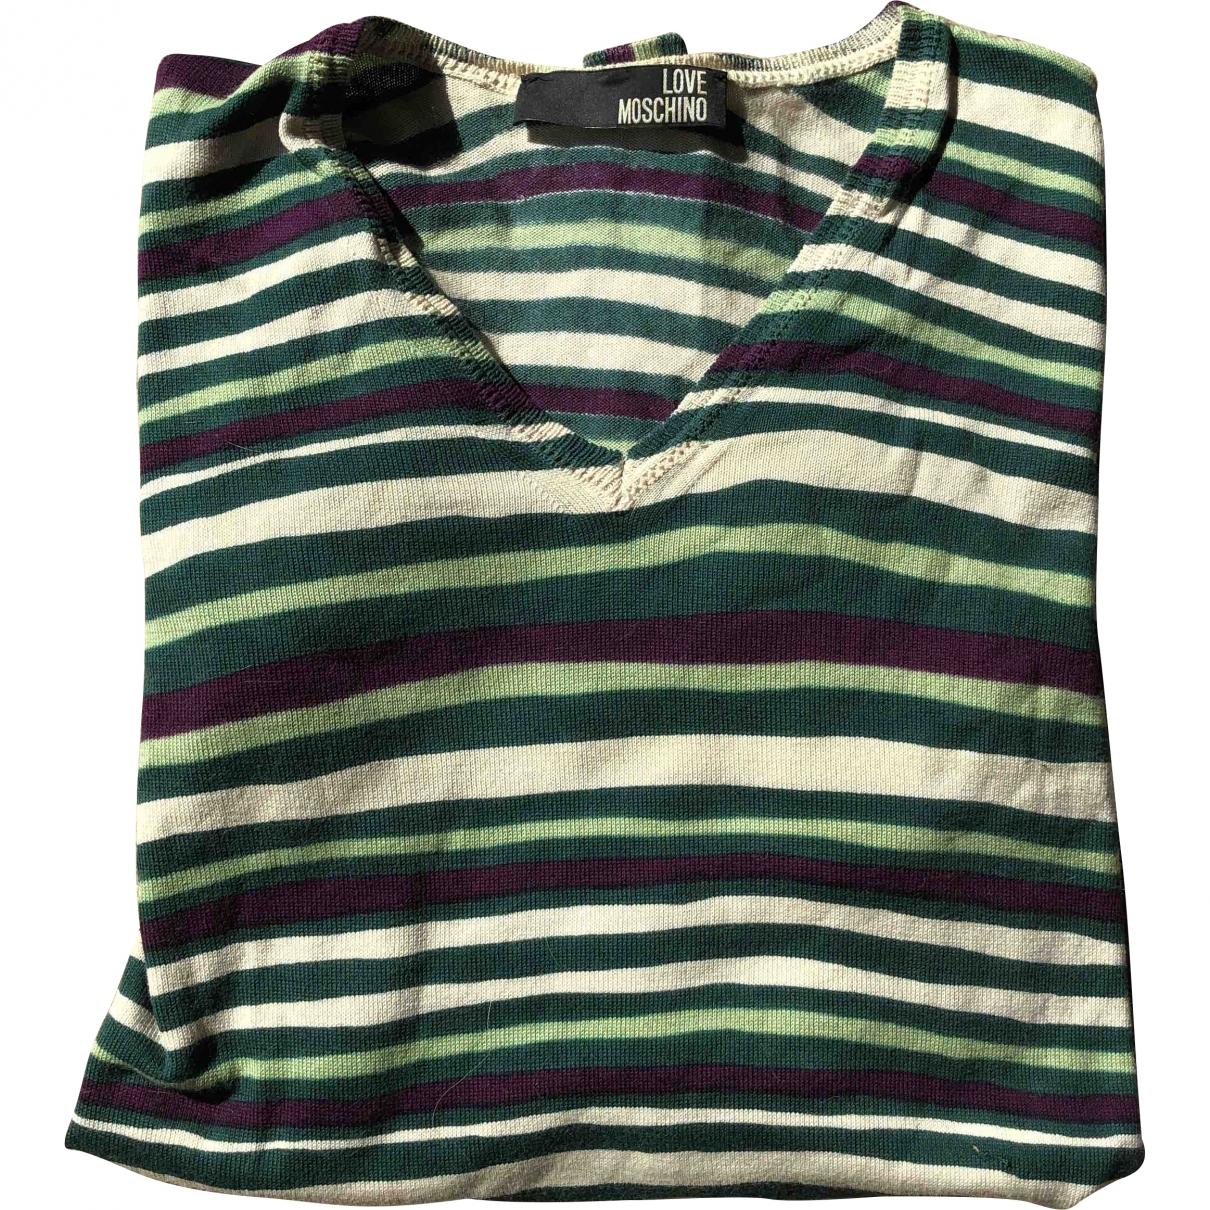 Moschino Love \N Green Cotton Knitwear & Sweatshirts for Men L International